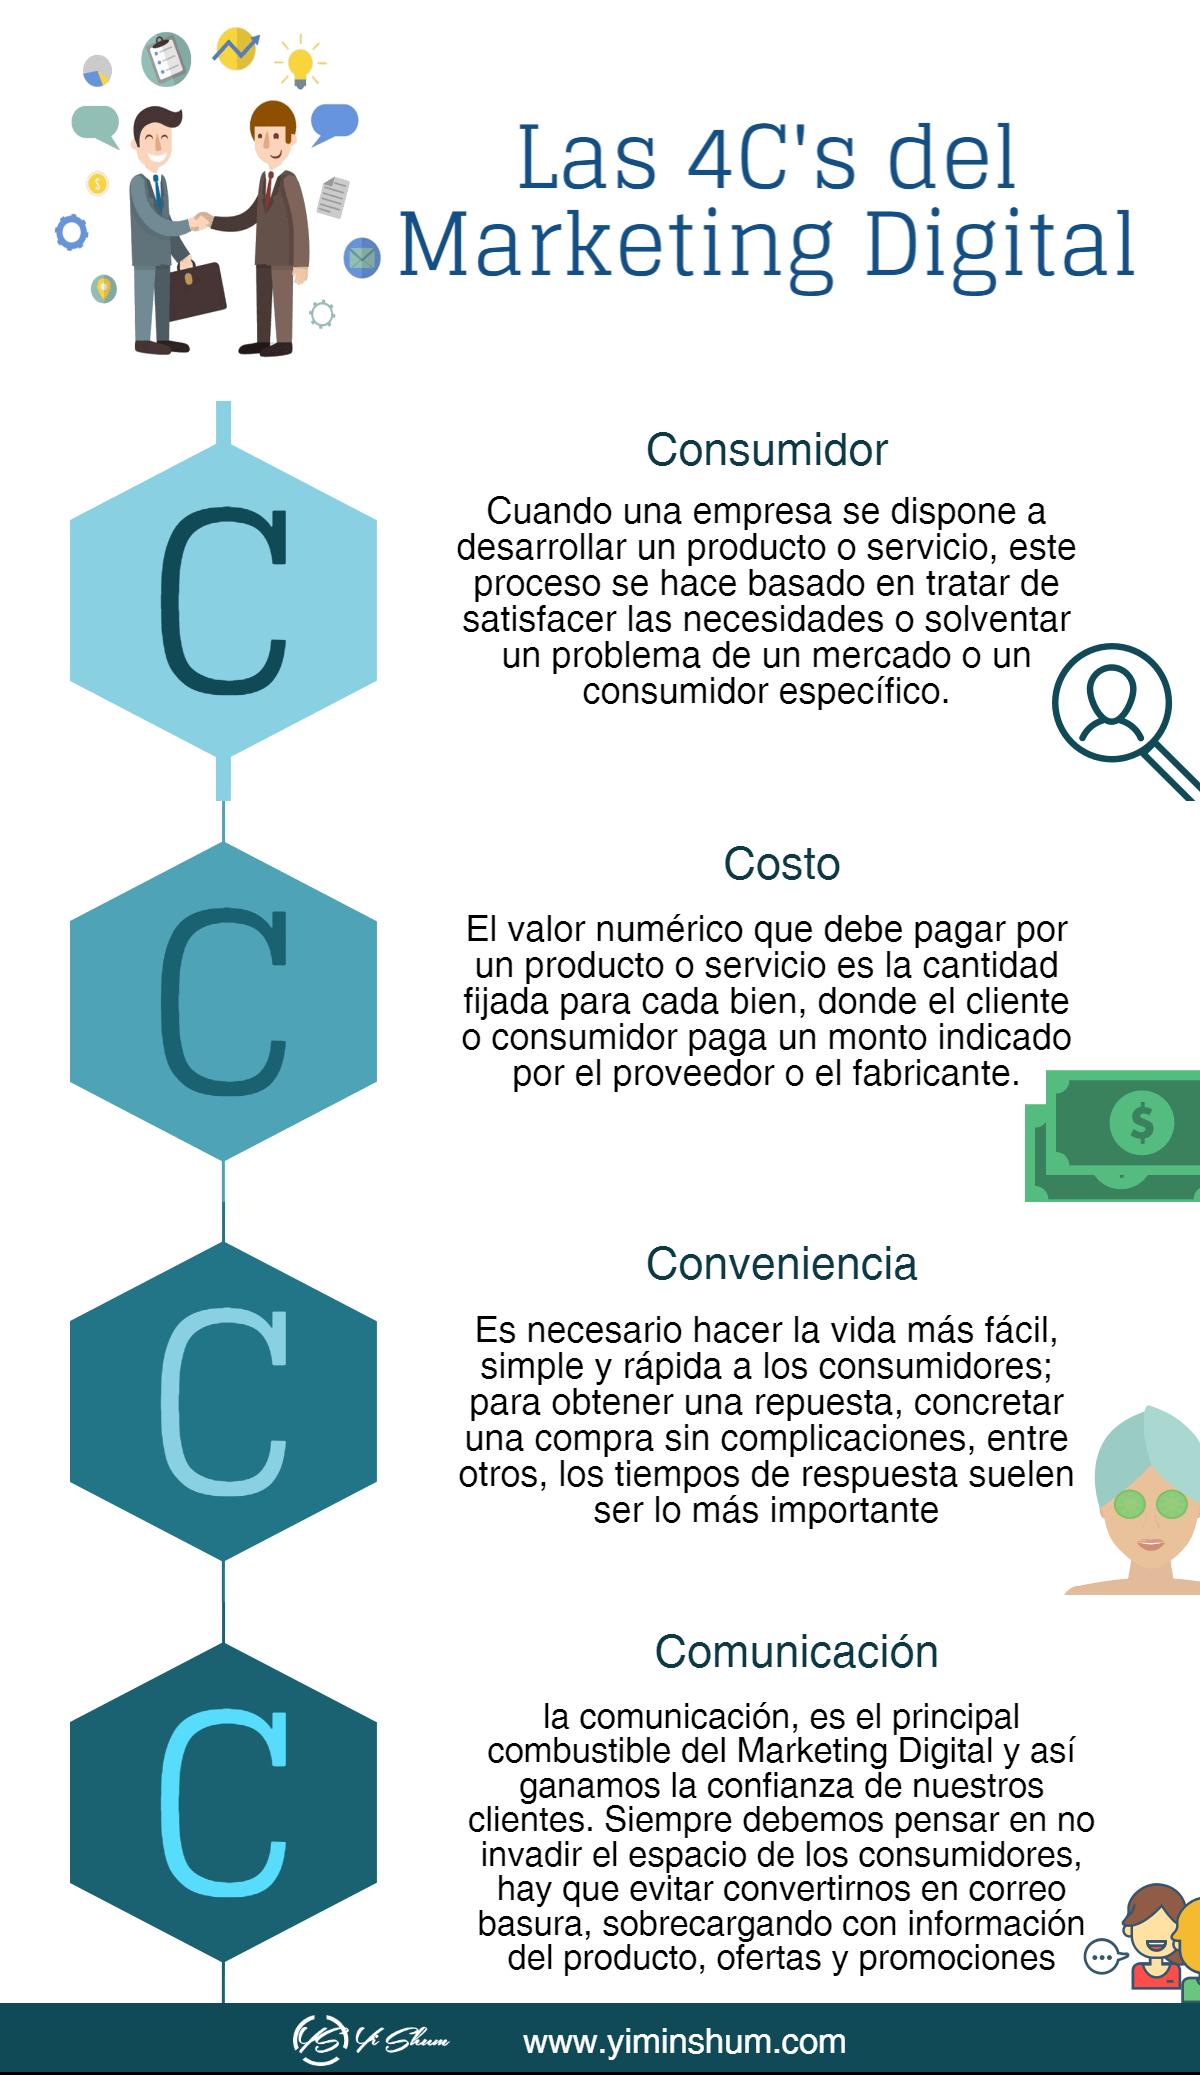 Marketing Mix: Las 4C del Marketing Digital